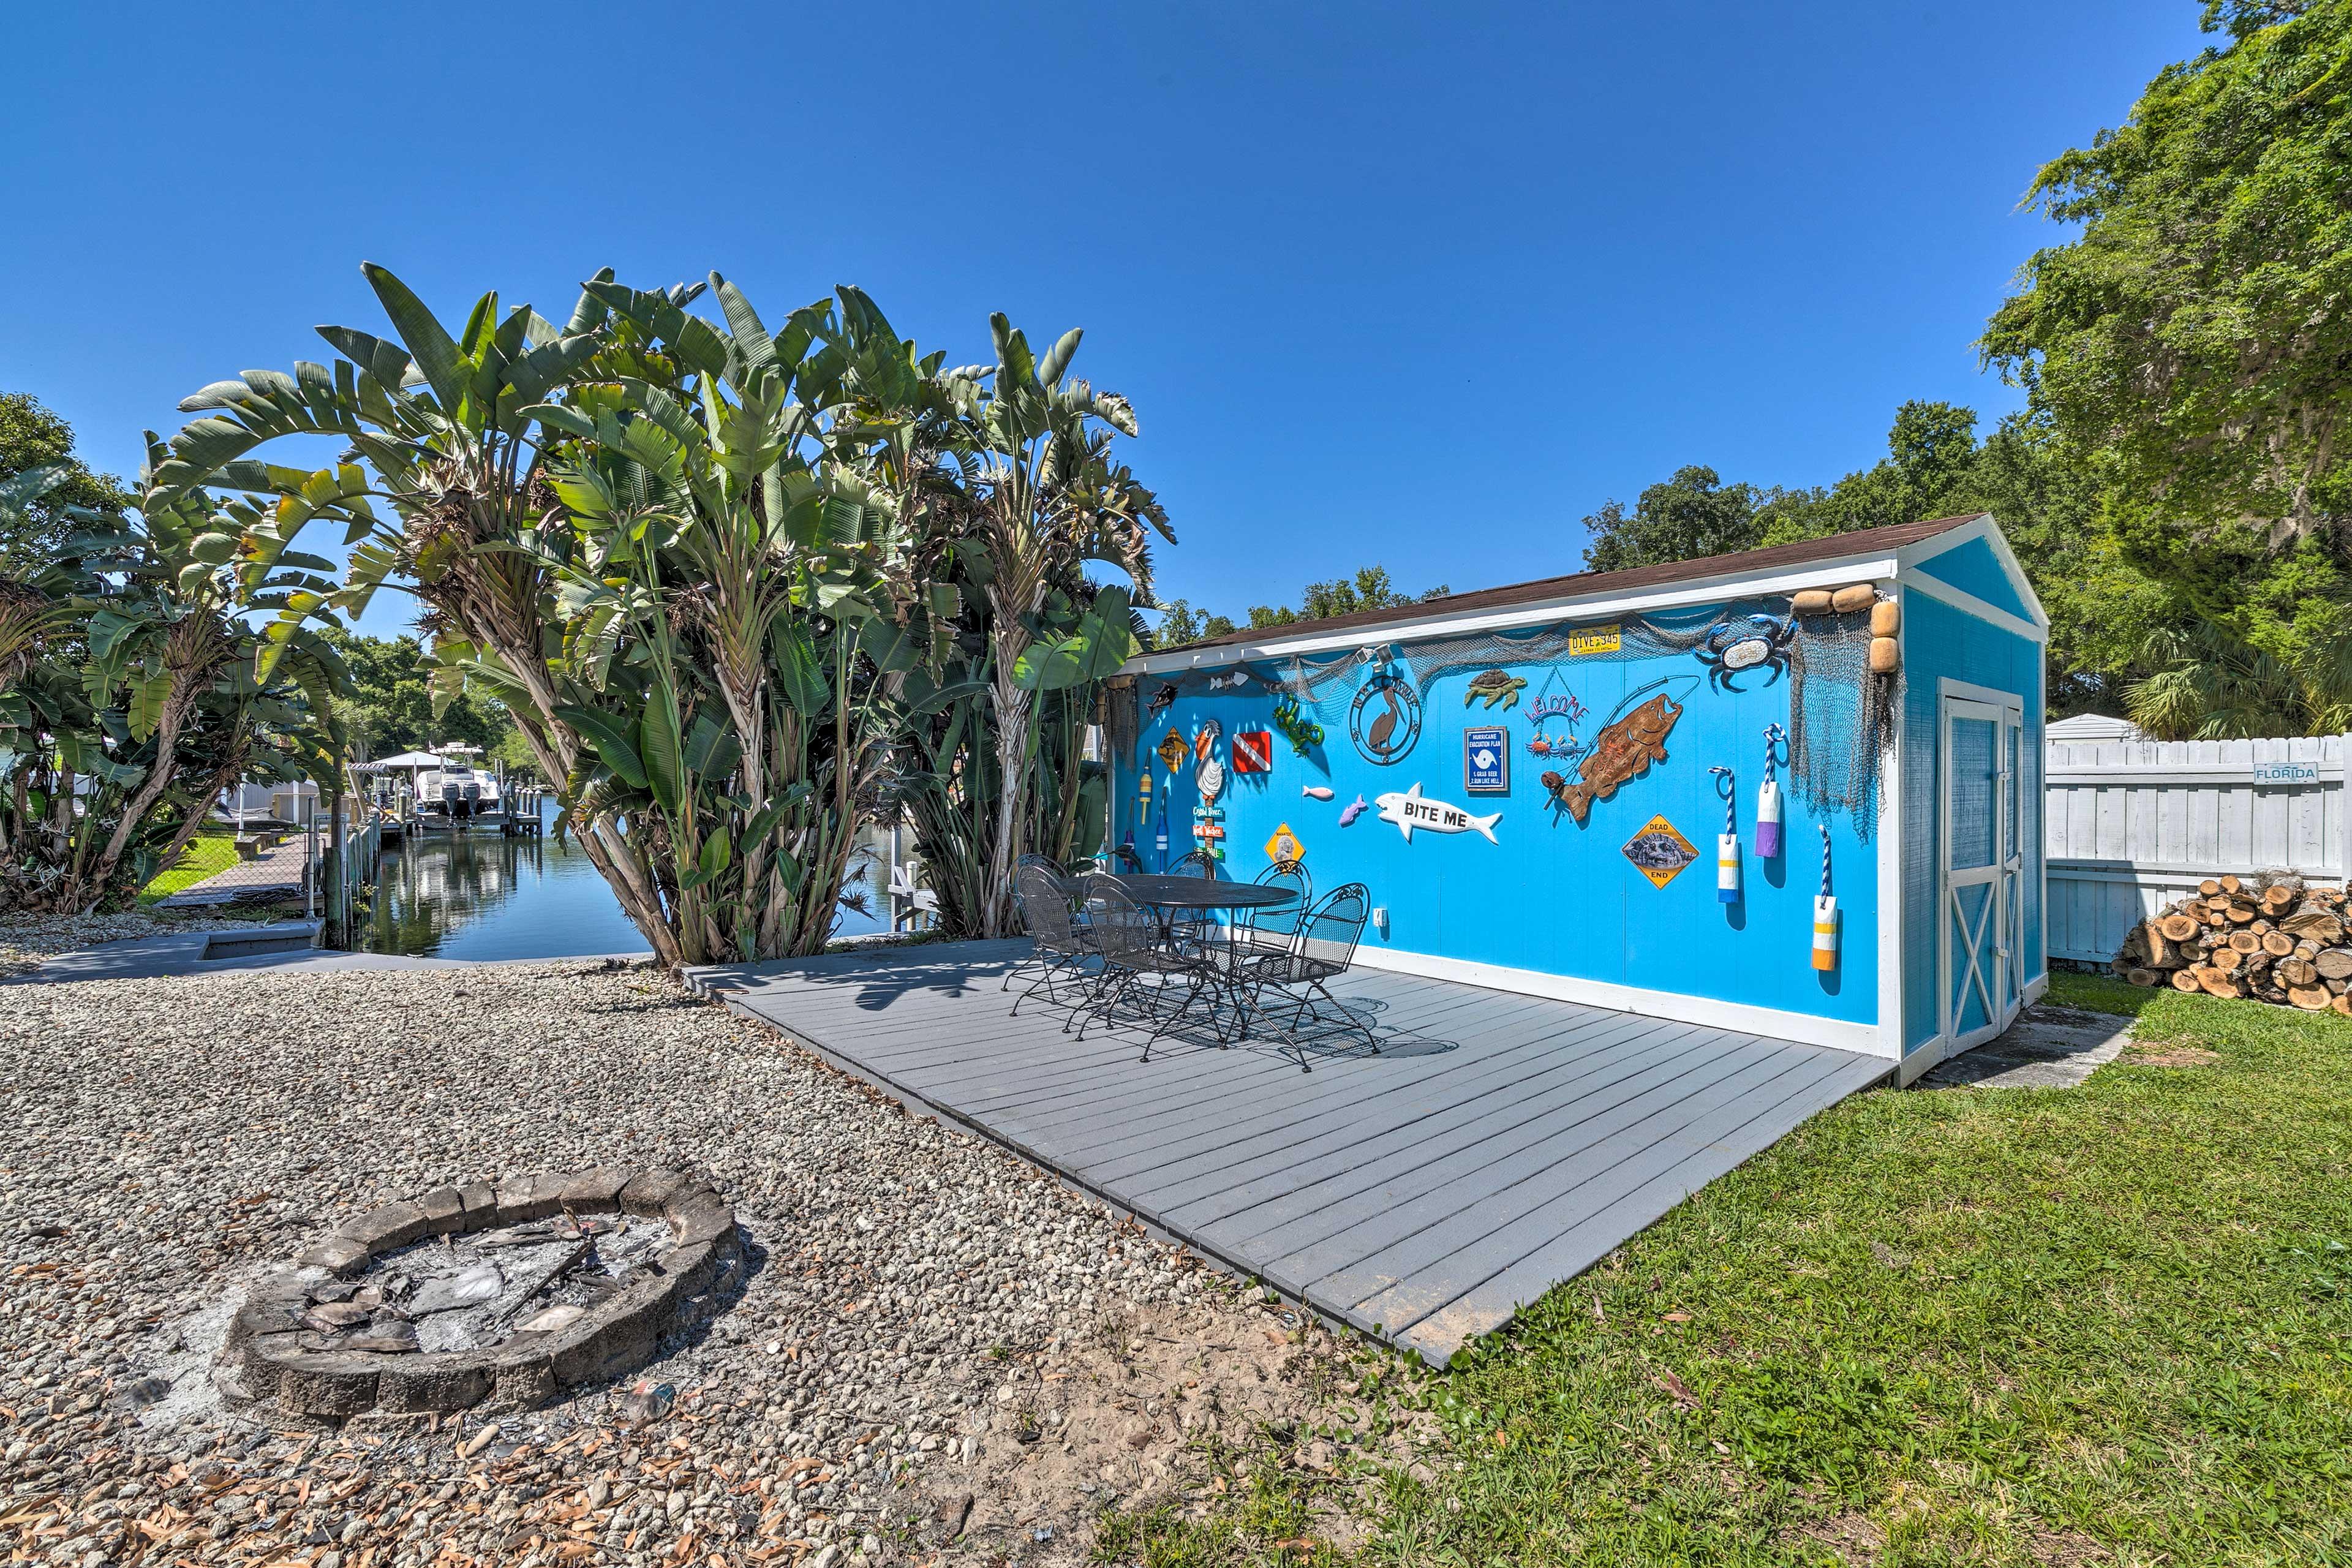 Your Florida oasis awaits at this 3-bed, 2-bath vacation rental!